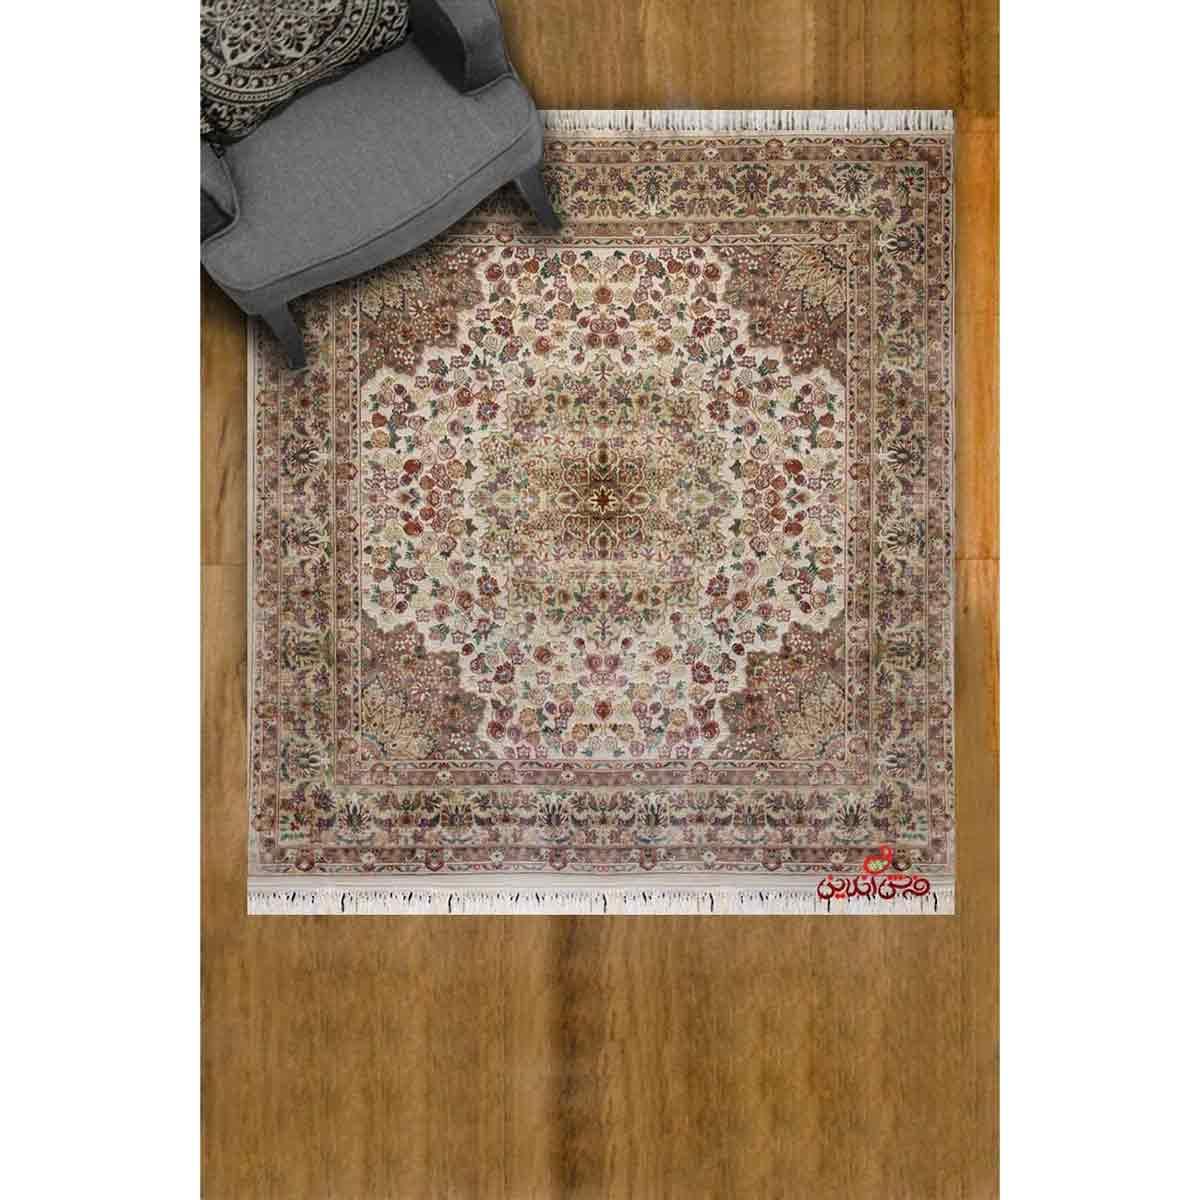 فرش شفقی وینتیج کد 9212